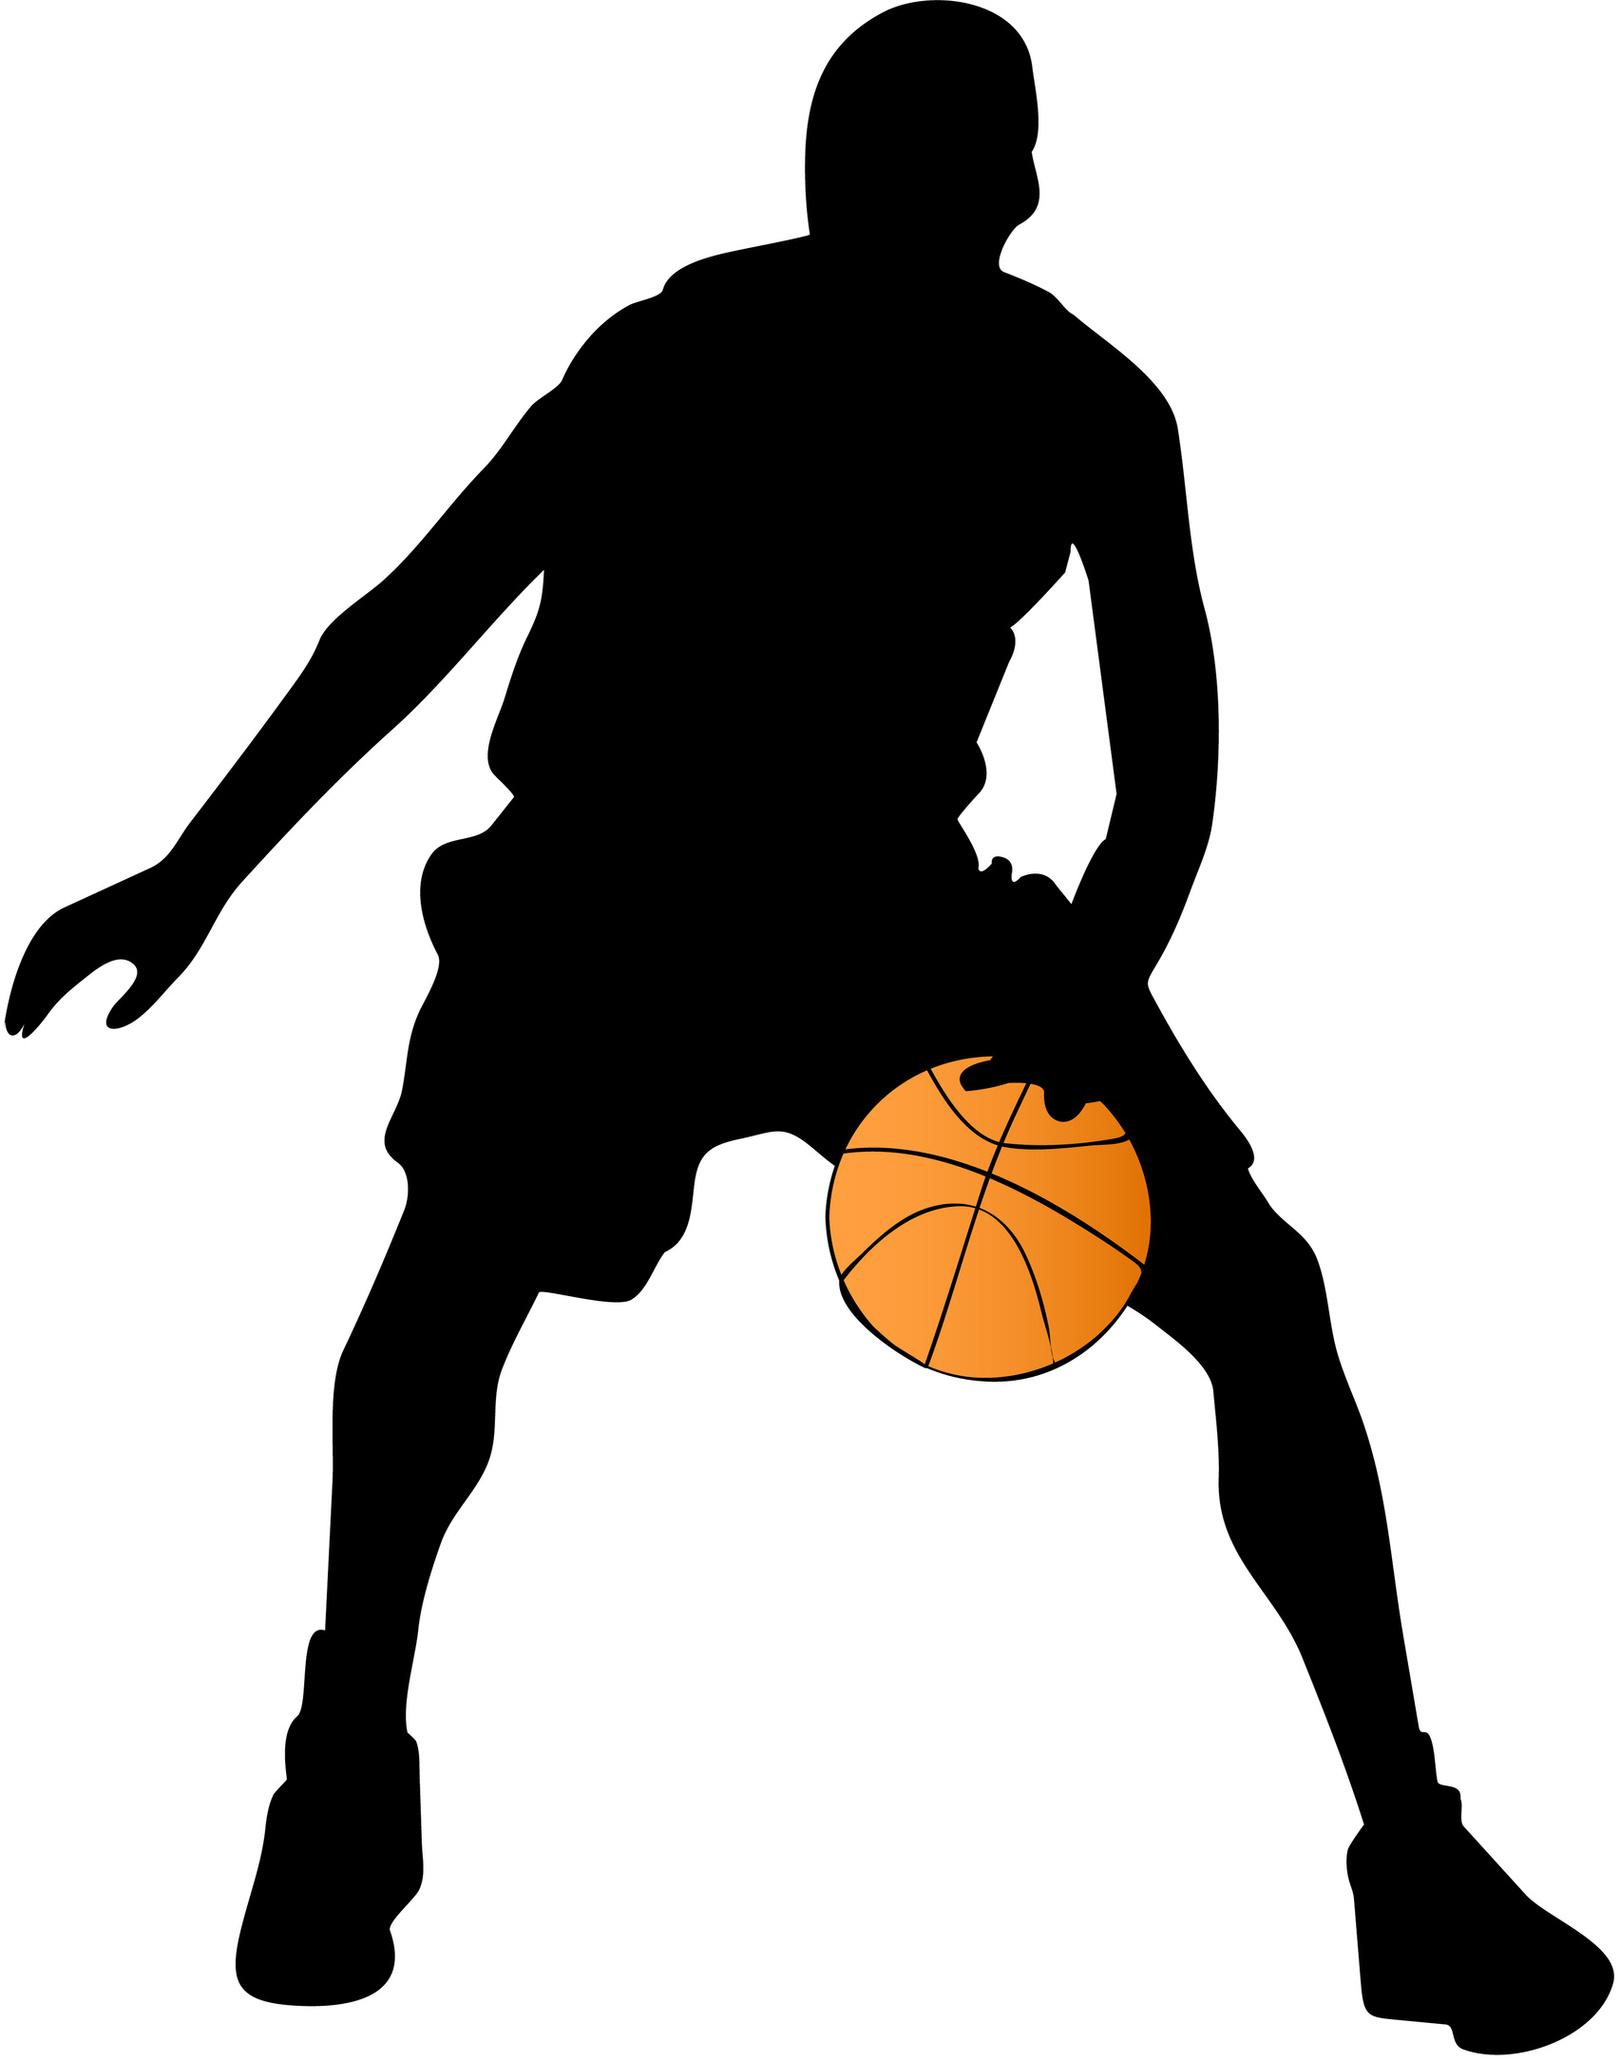 Basketball shadow clipart.